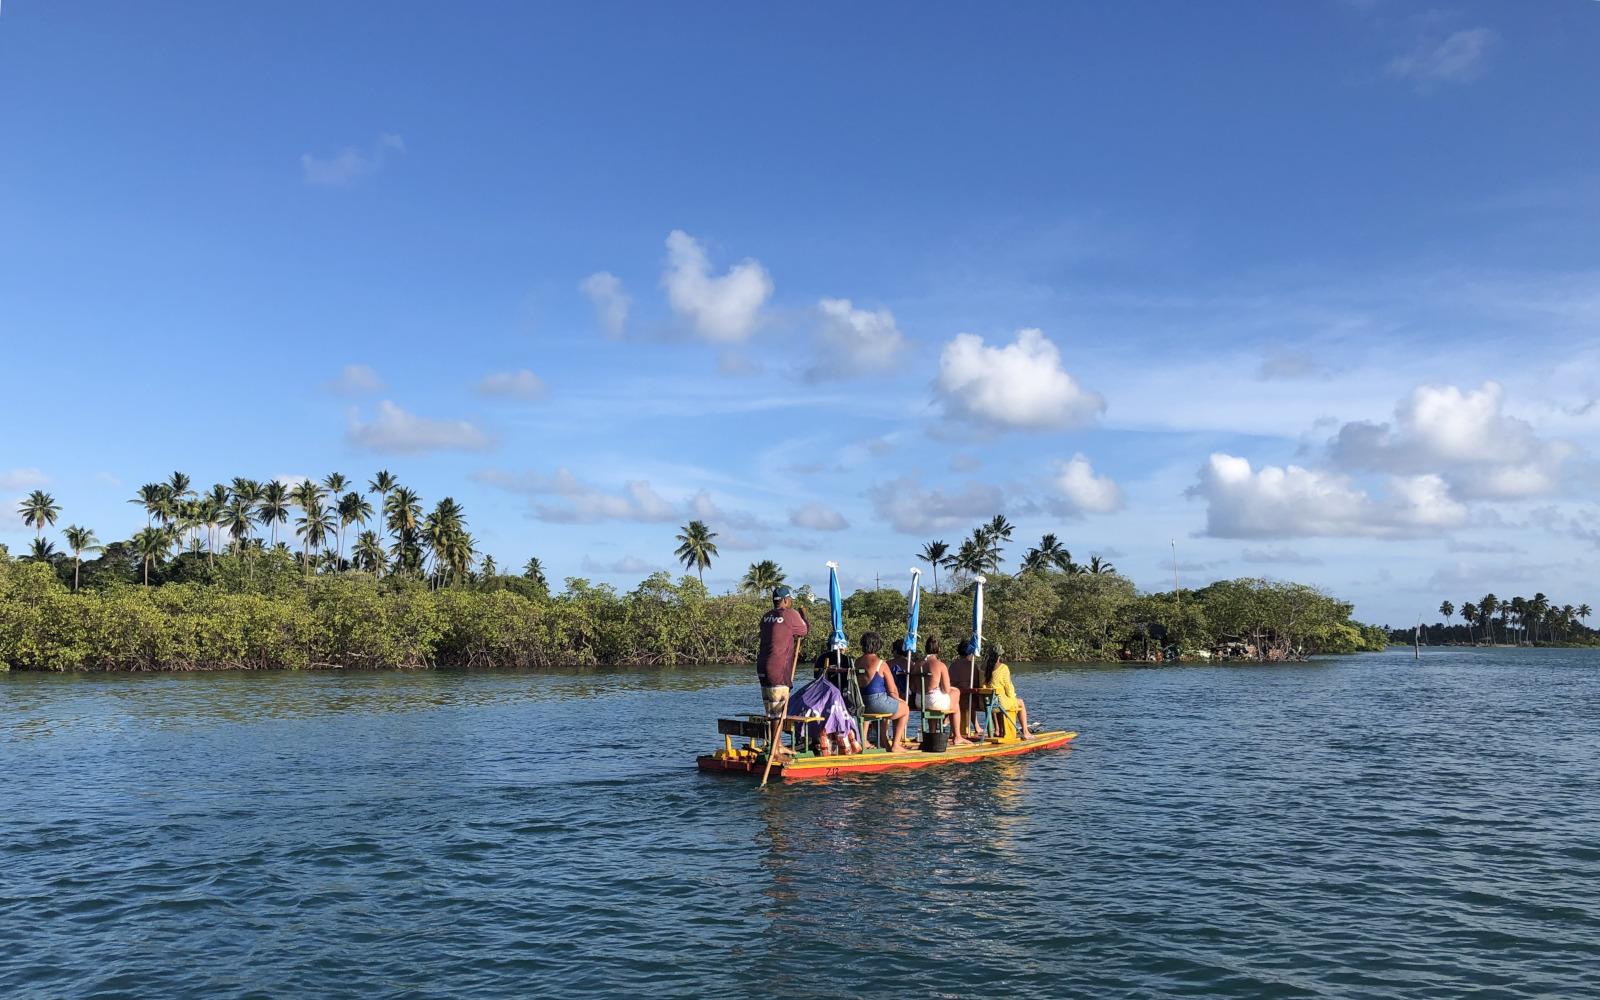 Giro in barca sul fiume Maracaípe, in Pernambuco. © oltreilbalcone